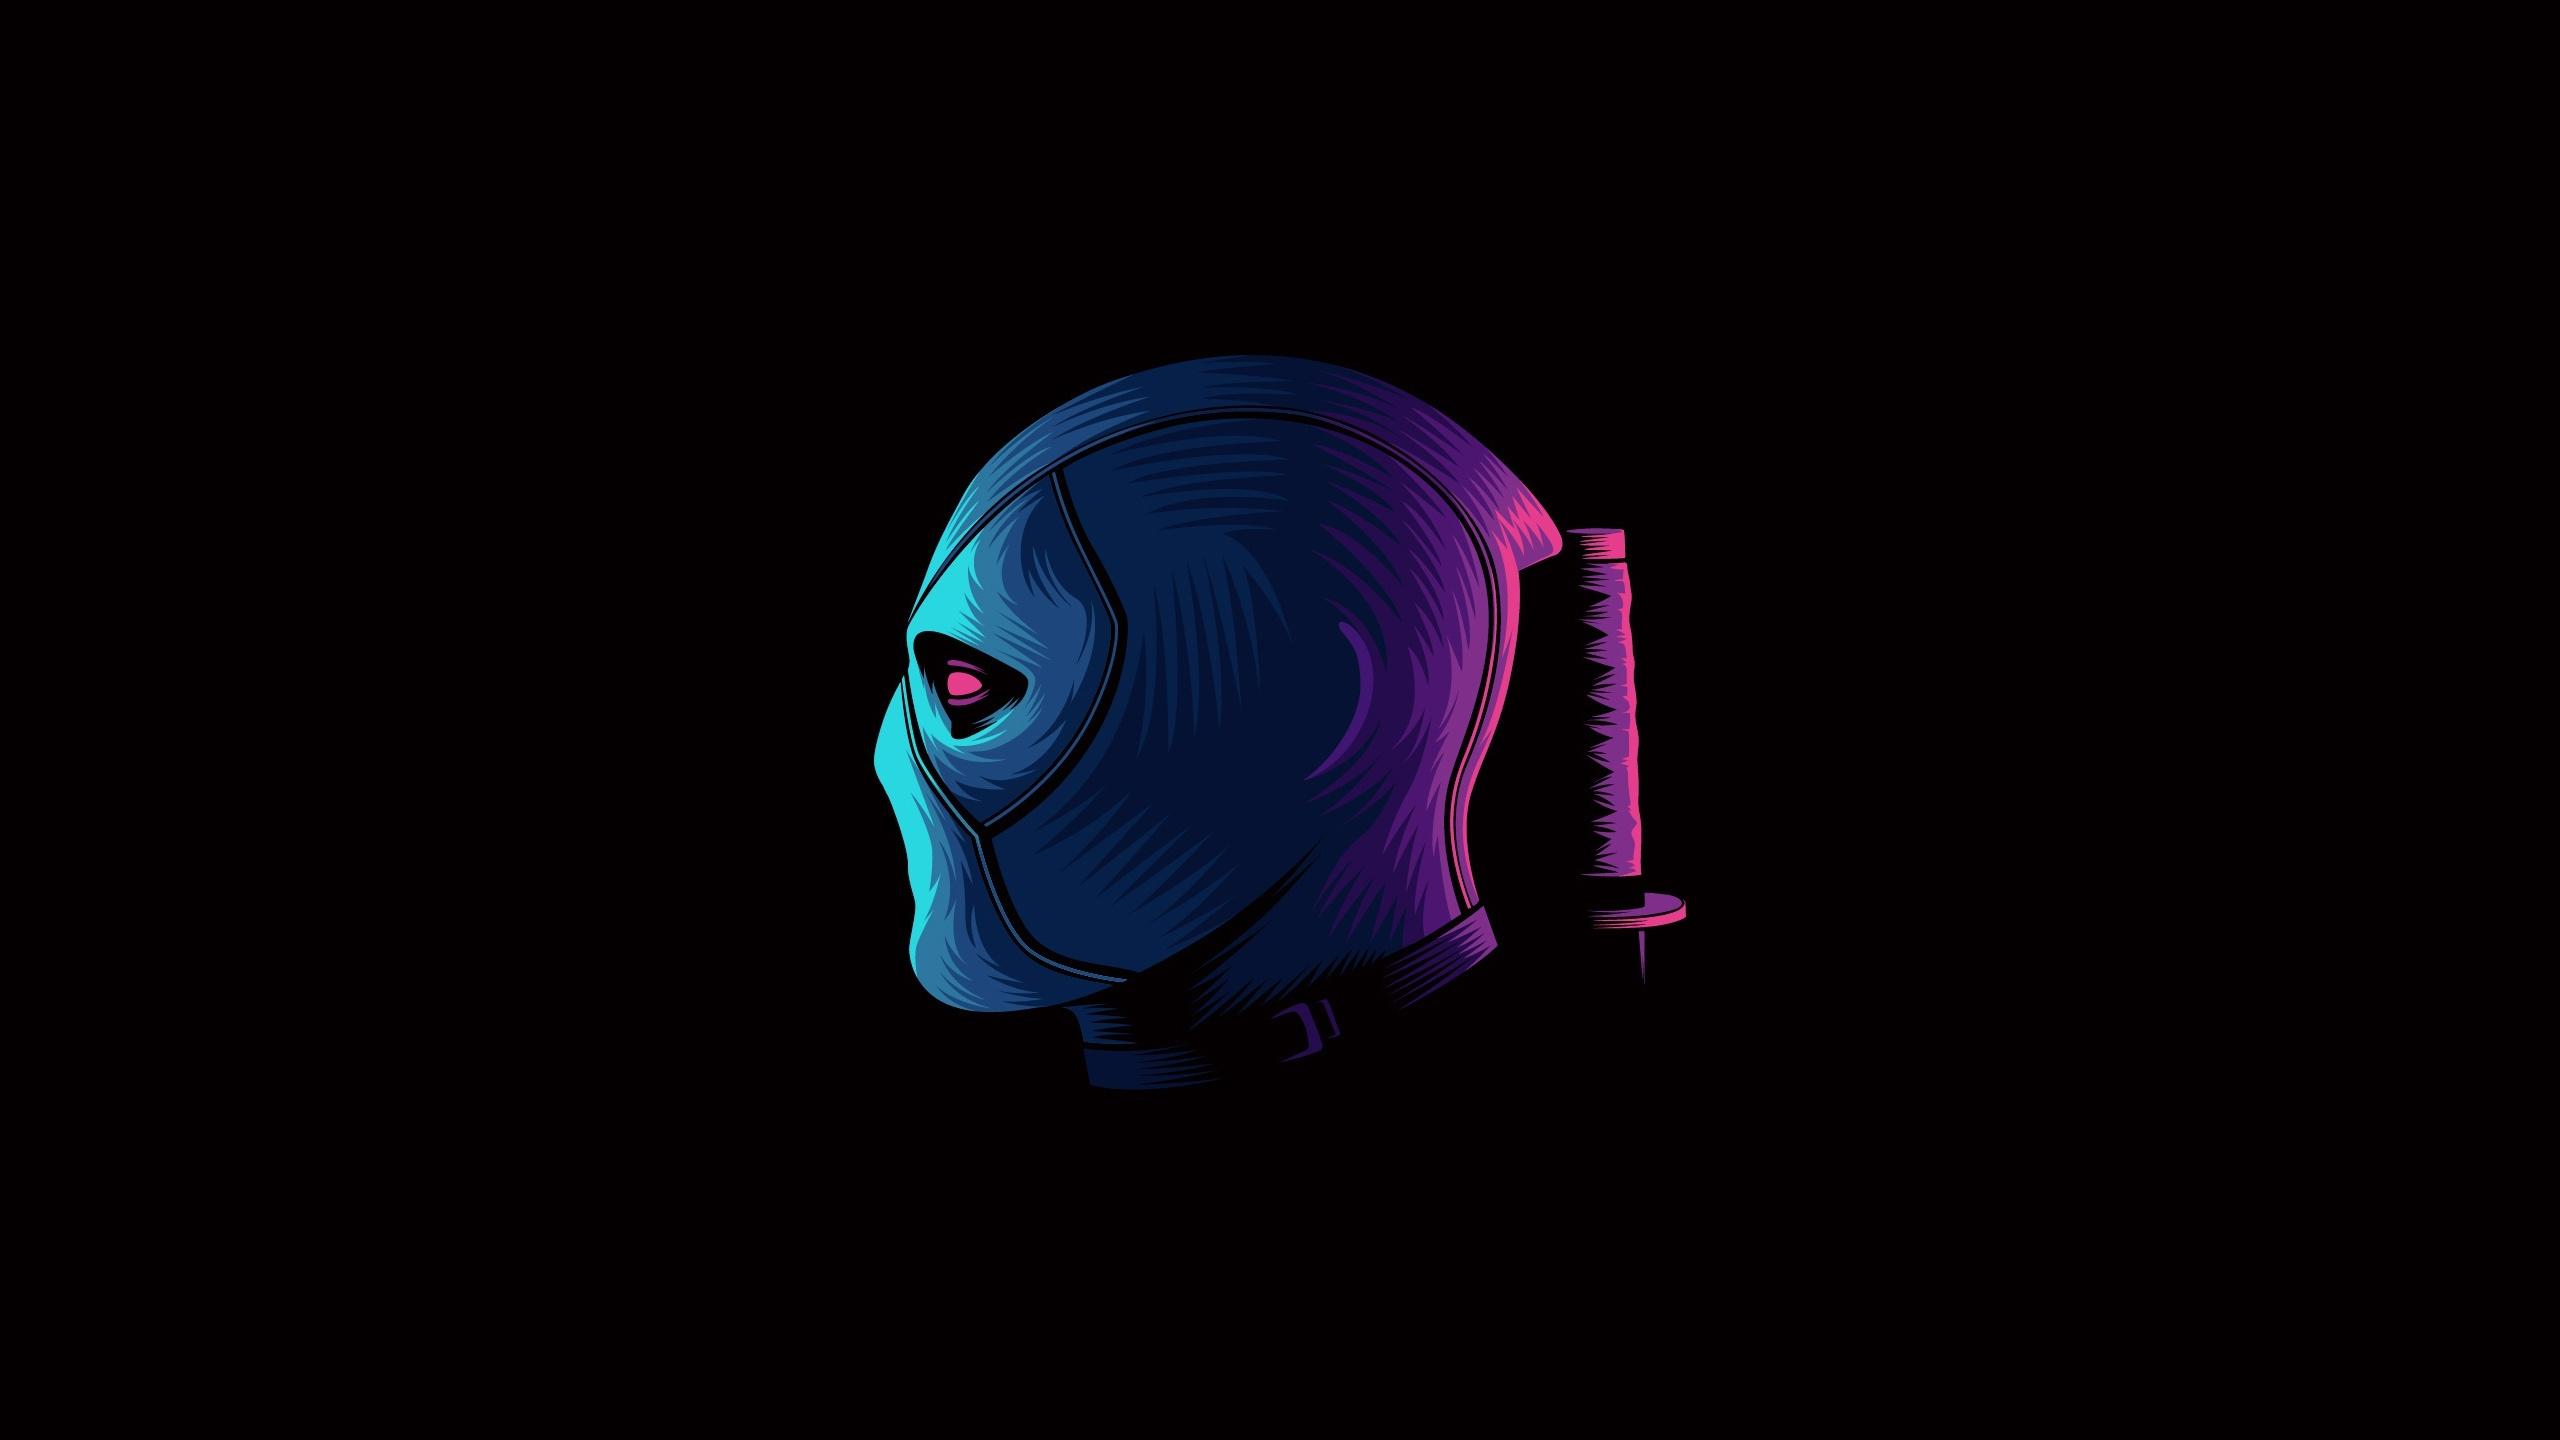 Deadpool Neon Minimal Wallpaper Hd Minimalist 4k Wallpapers